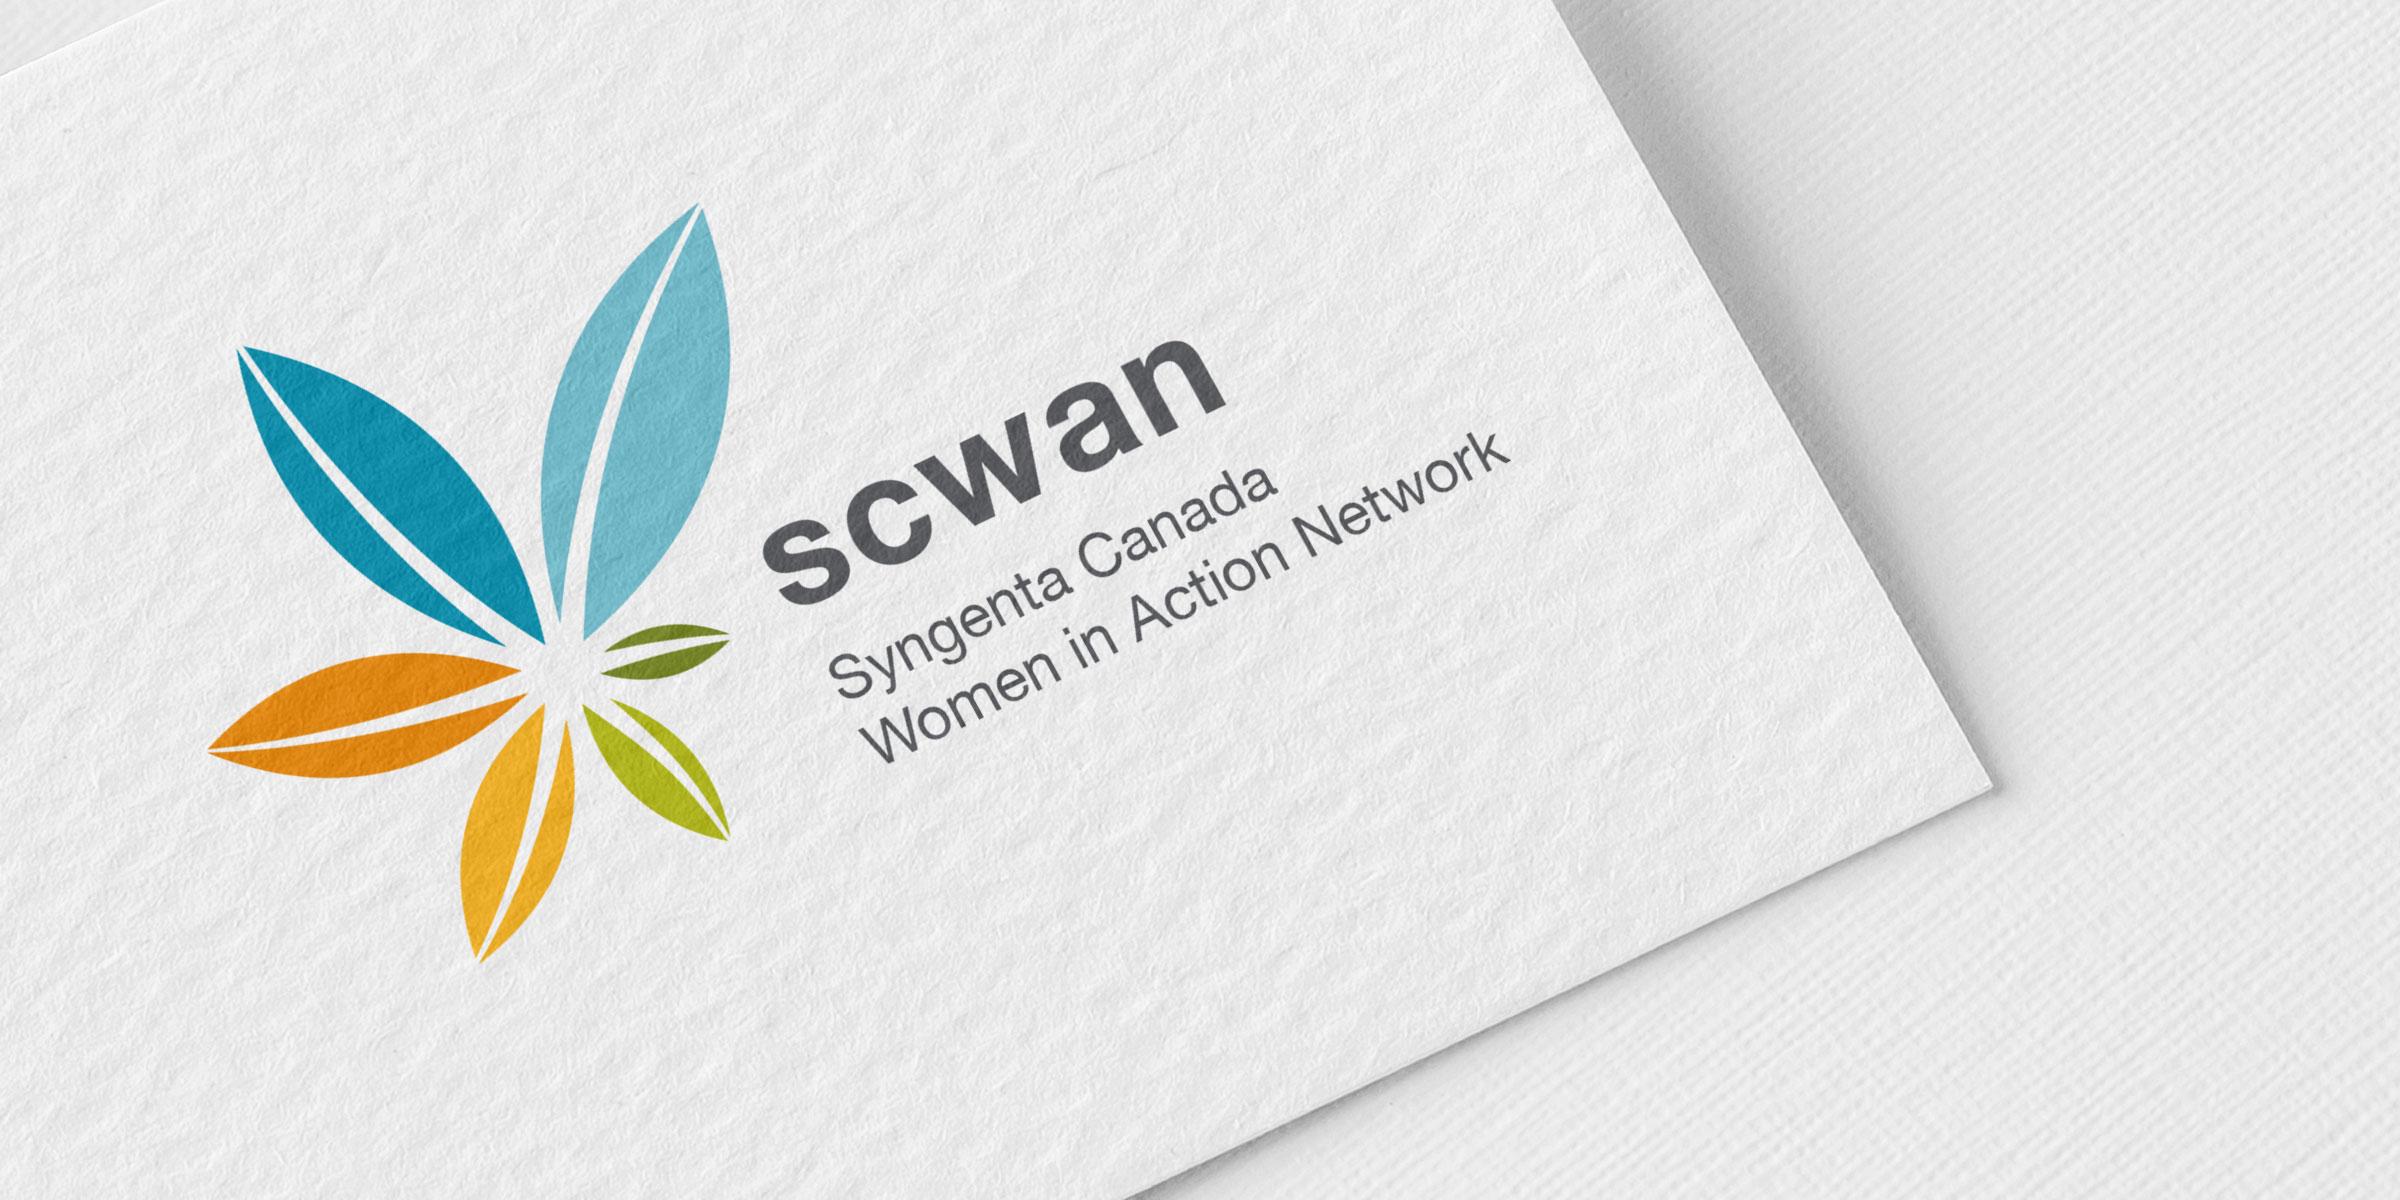 syngenta logo on business card